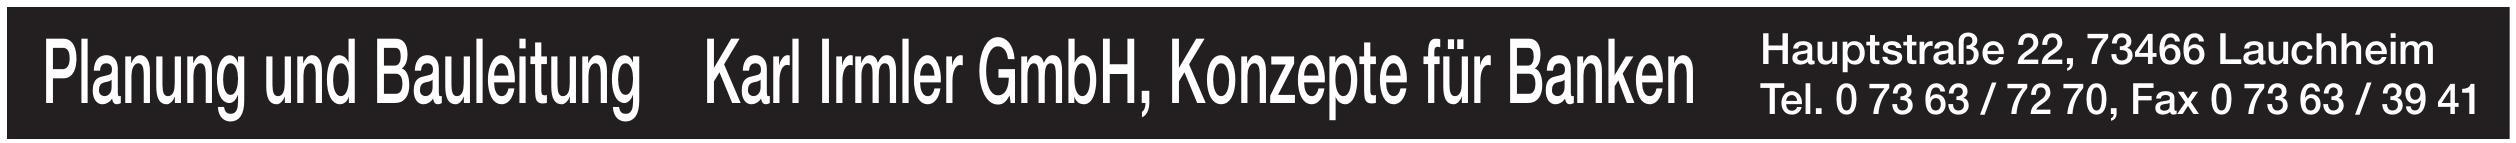 Karl Irmler GmbH